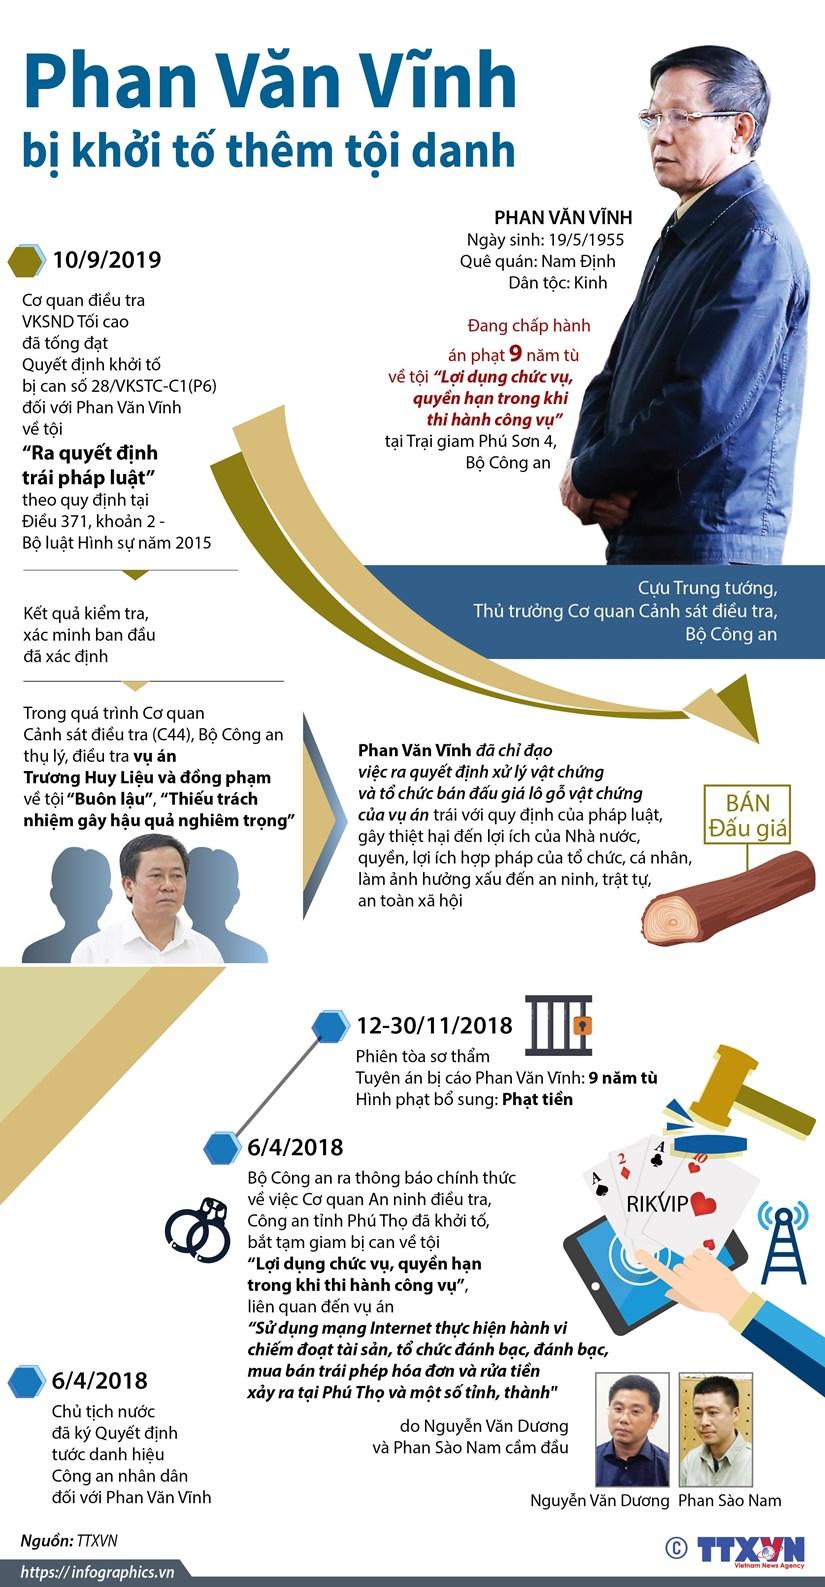 [Infographics] Khoi to them toi danh doi voi Phan Van Vinh hinh anh 1